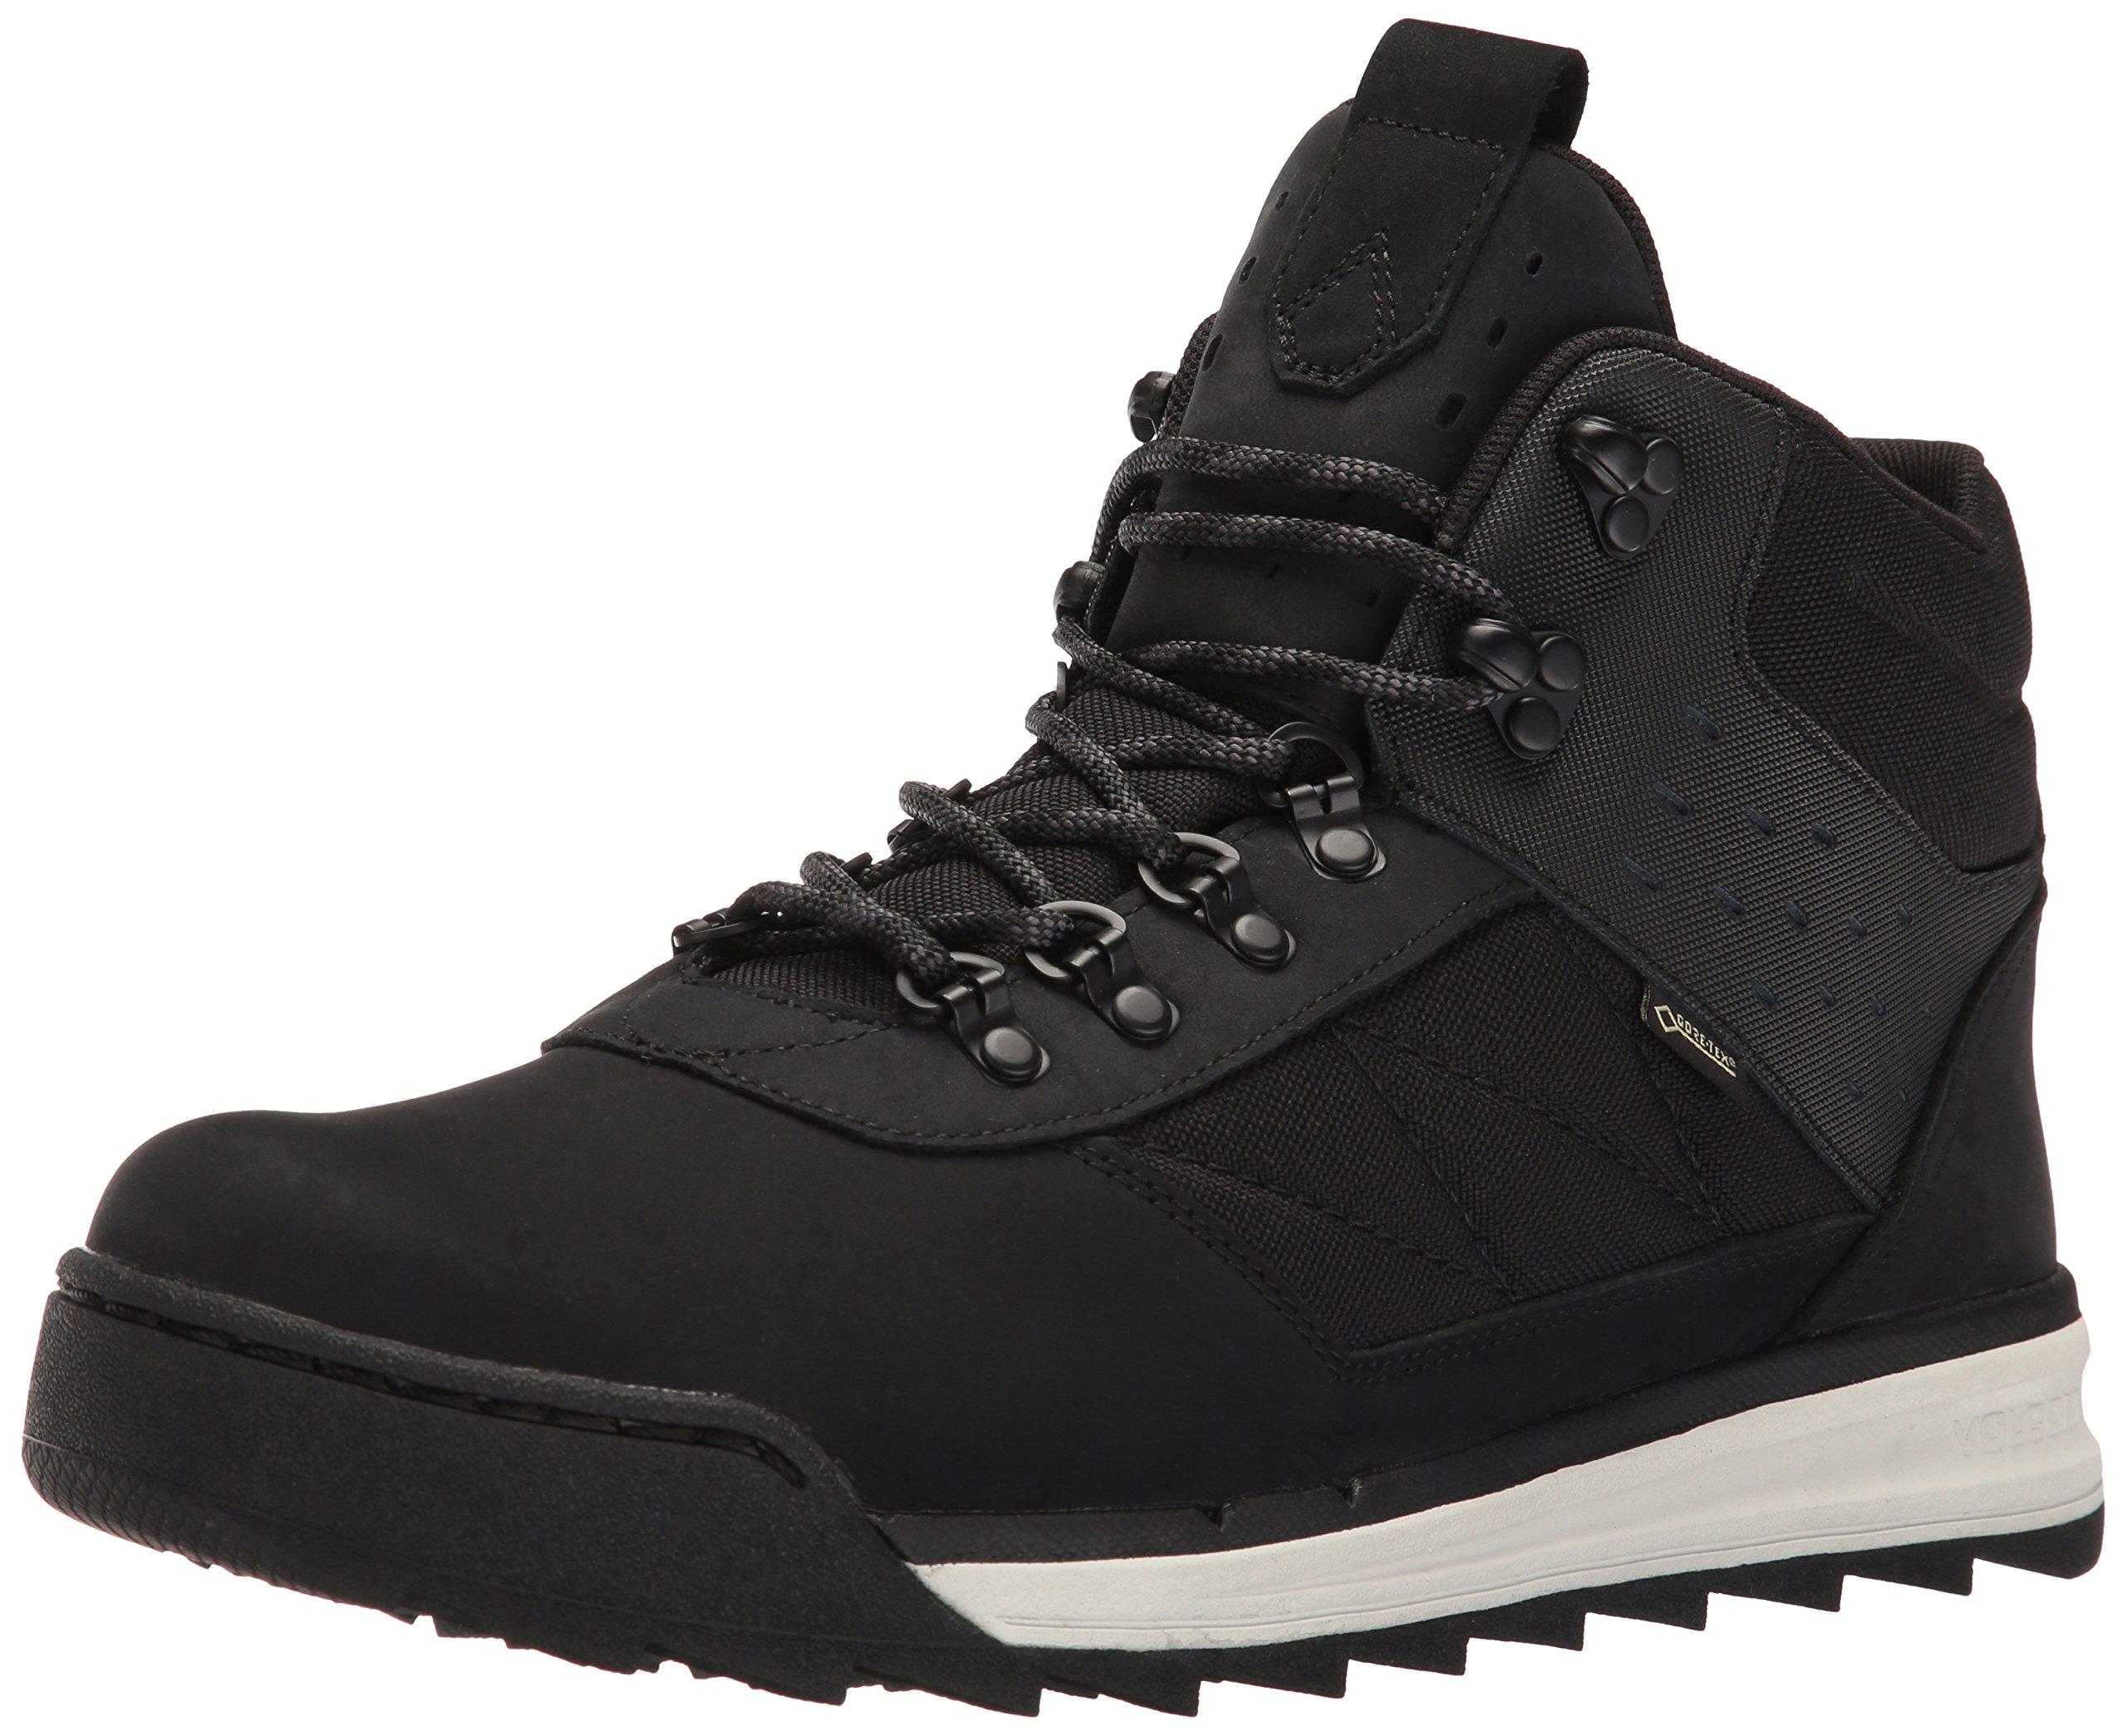 Volcom Men's Shelterlen Gore-Tex Winter Boot, Black Destructo, 11.5 D US